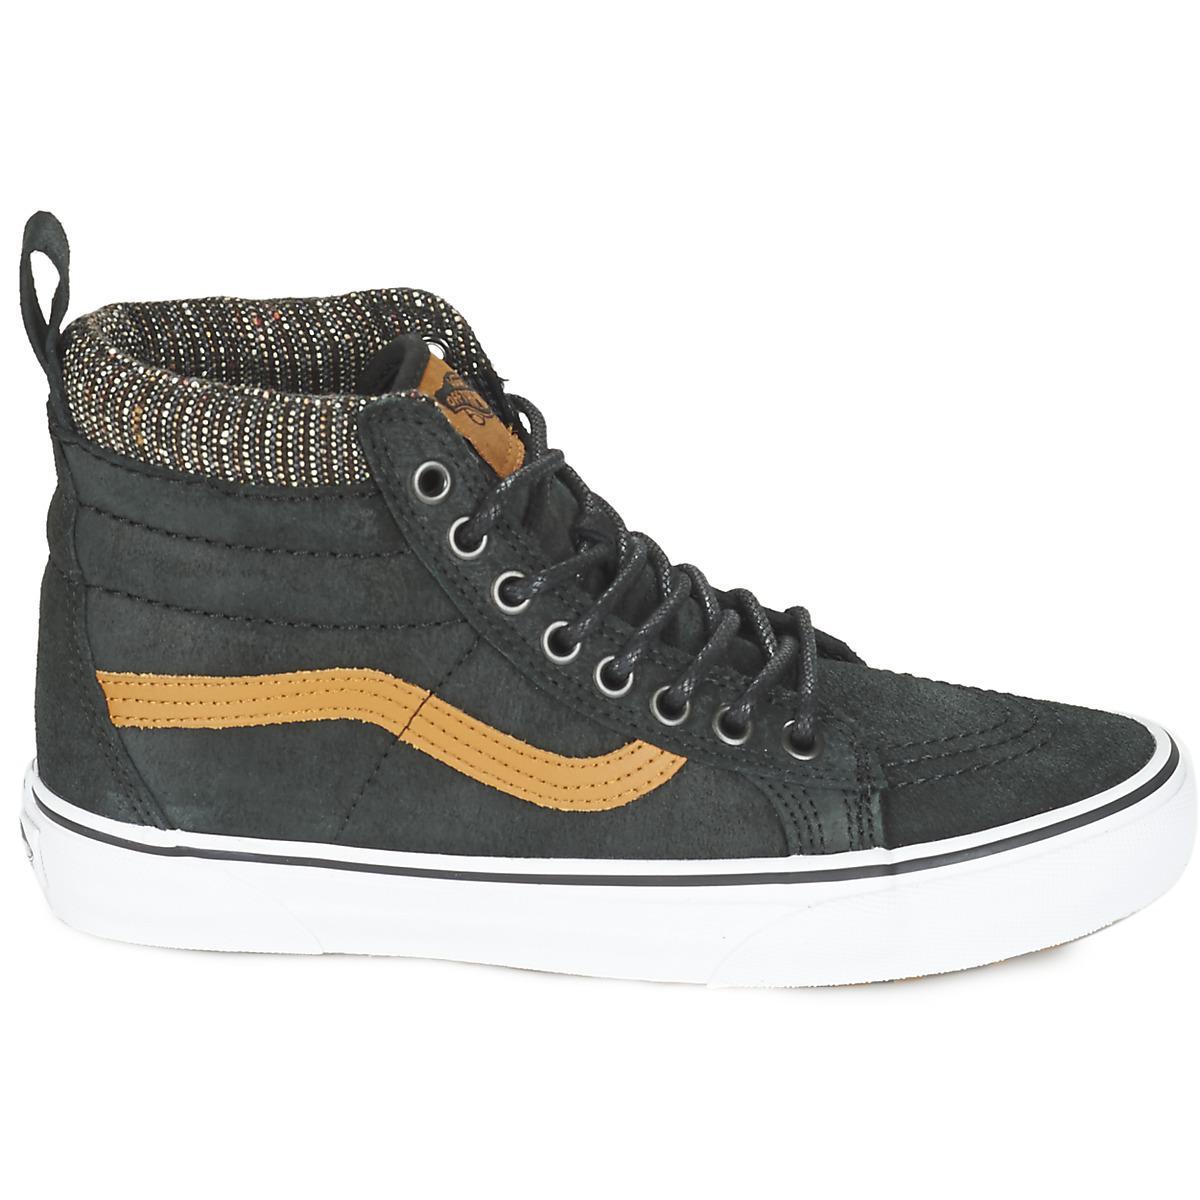 In Vans Shoes Trainers Mte high Sk8 Black Hi Save Top qvqwp0C